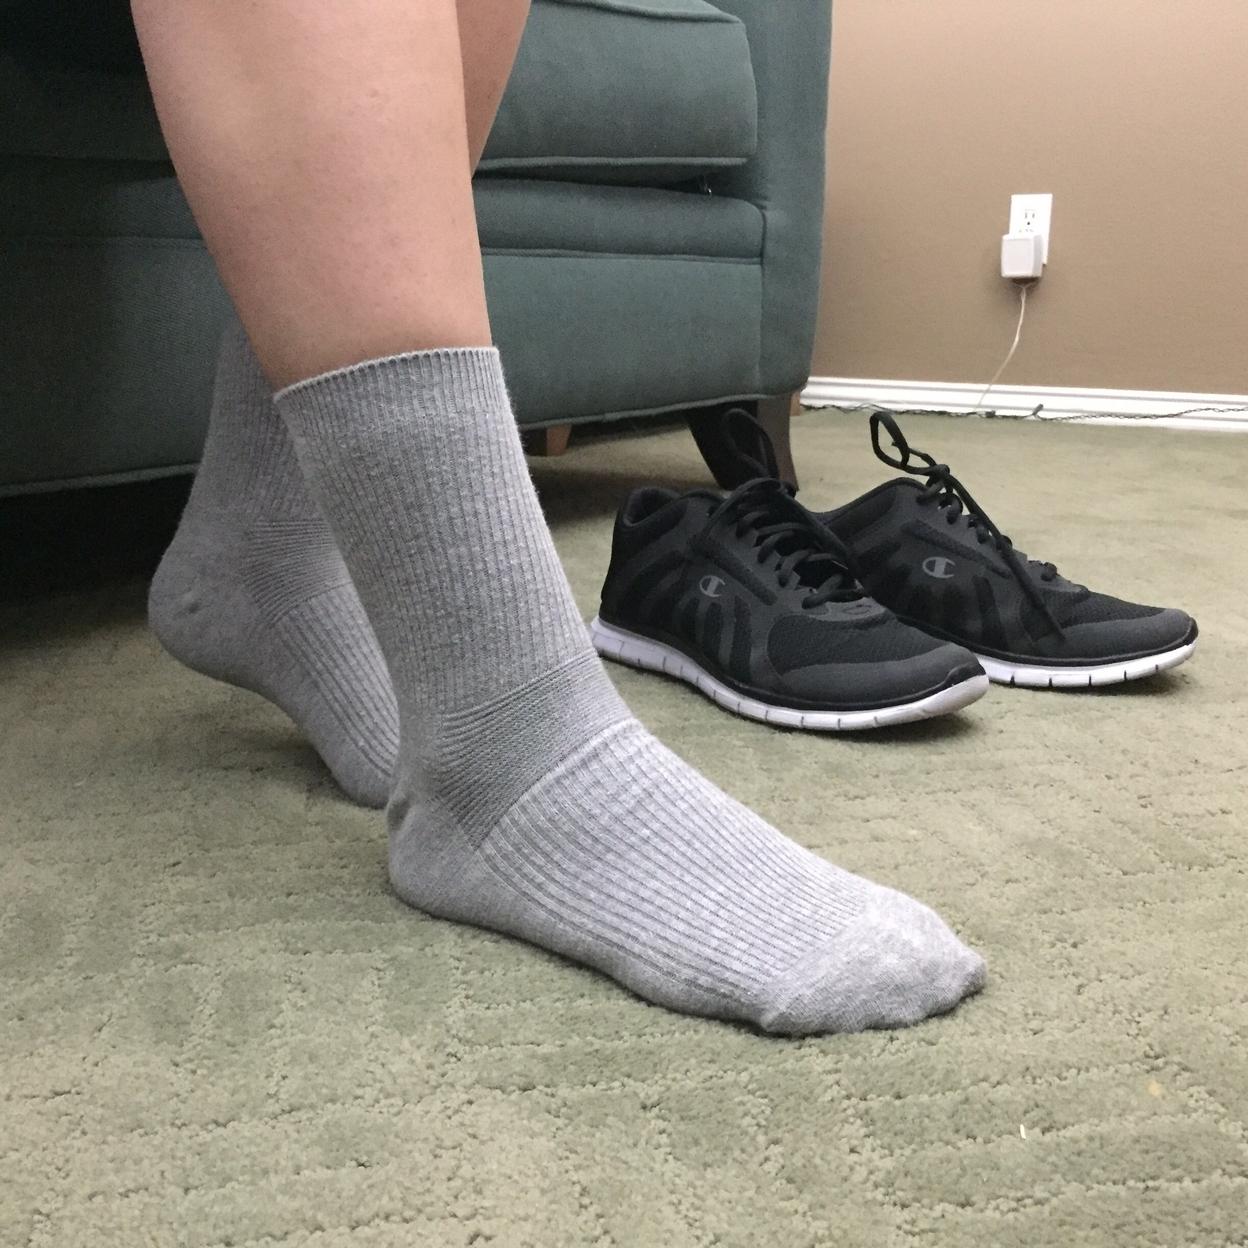 Natural Relief Socks (Grey) - Single 54d28a2e4b3d6f79778b4b2c